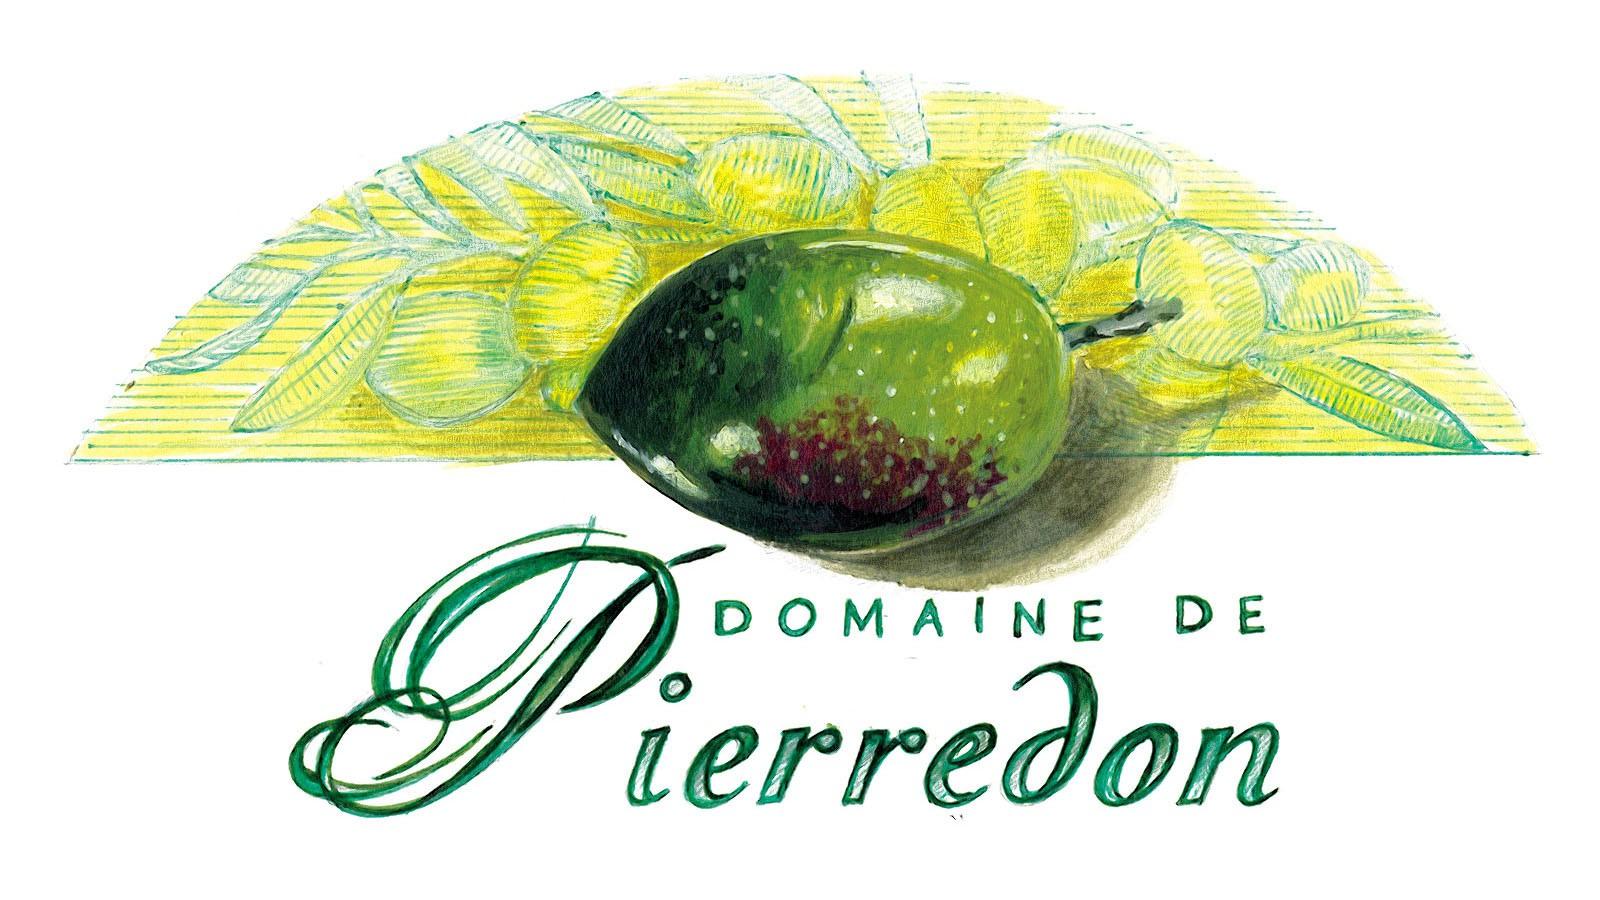 Domaine de Pierredon